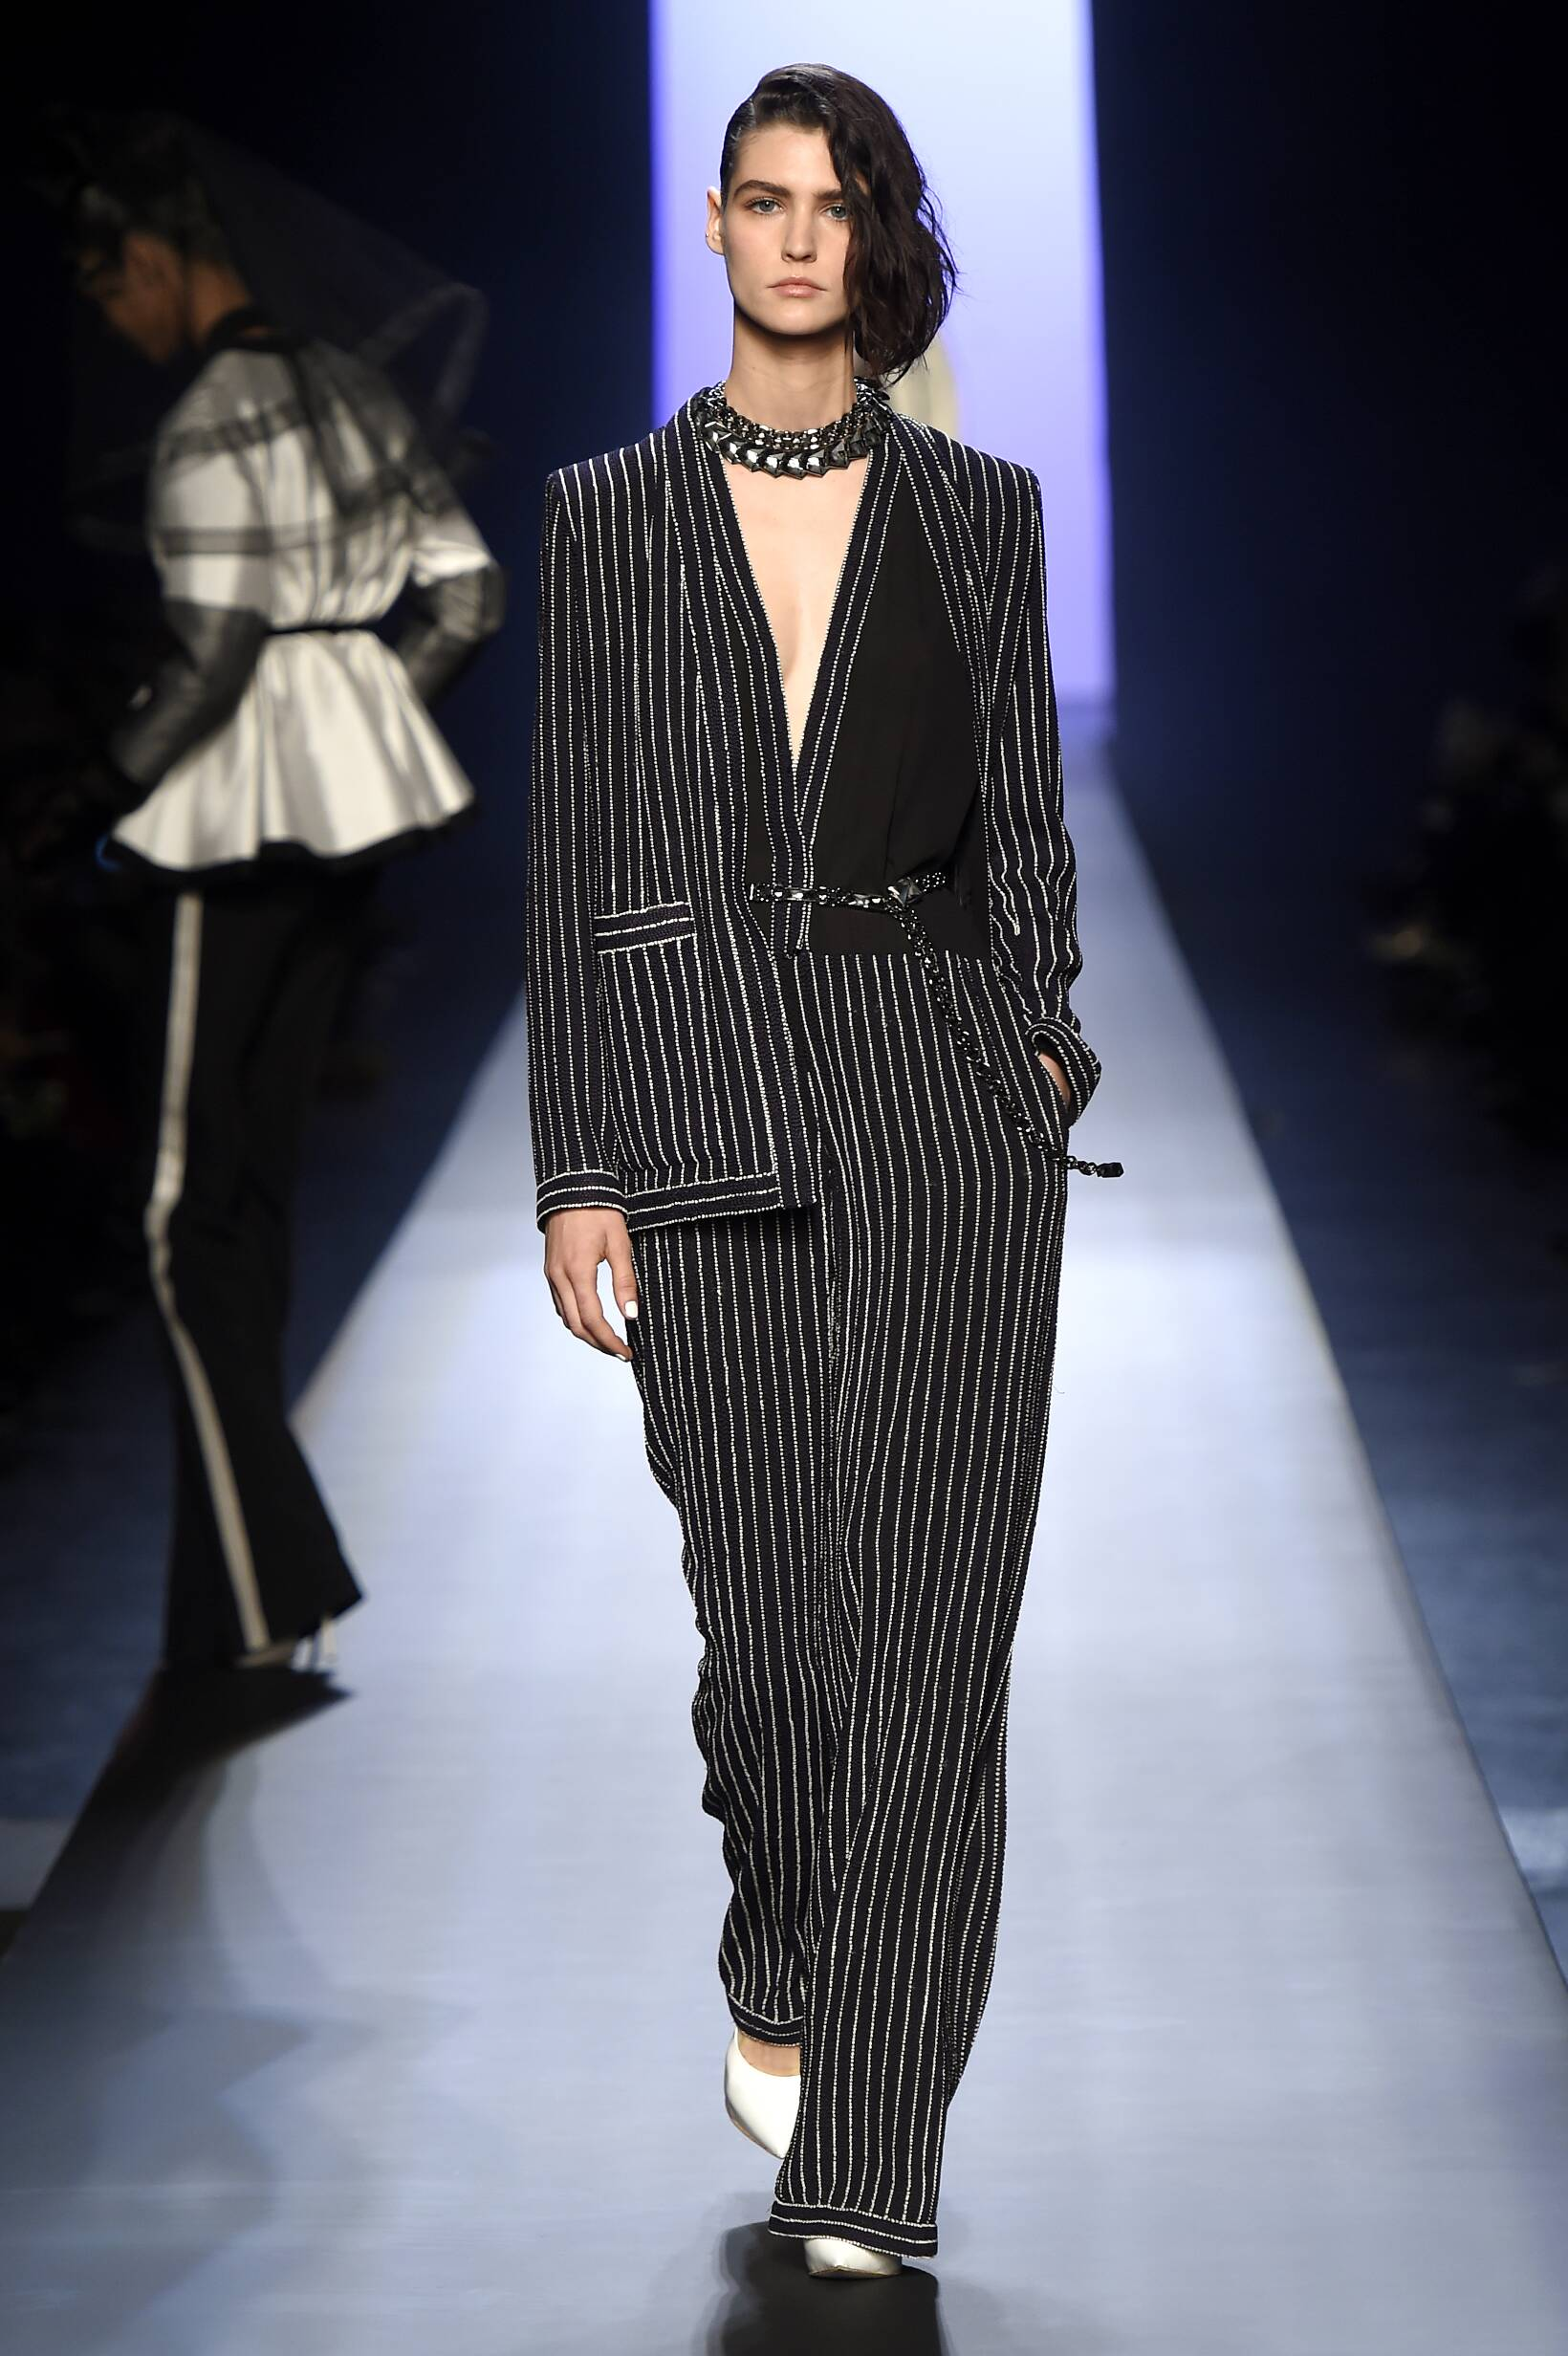 Jean Paul Gaultier Haute Couture Collection Catwalk